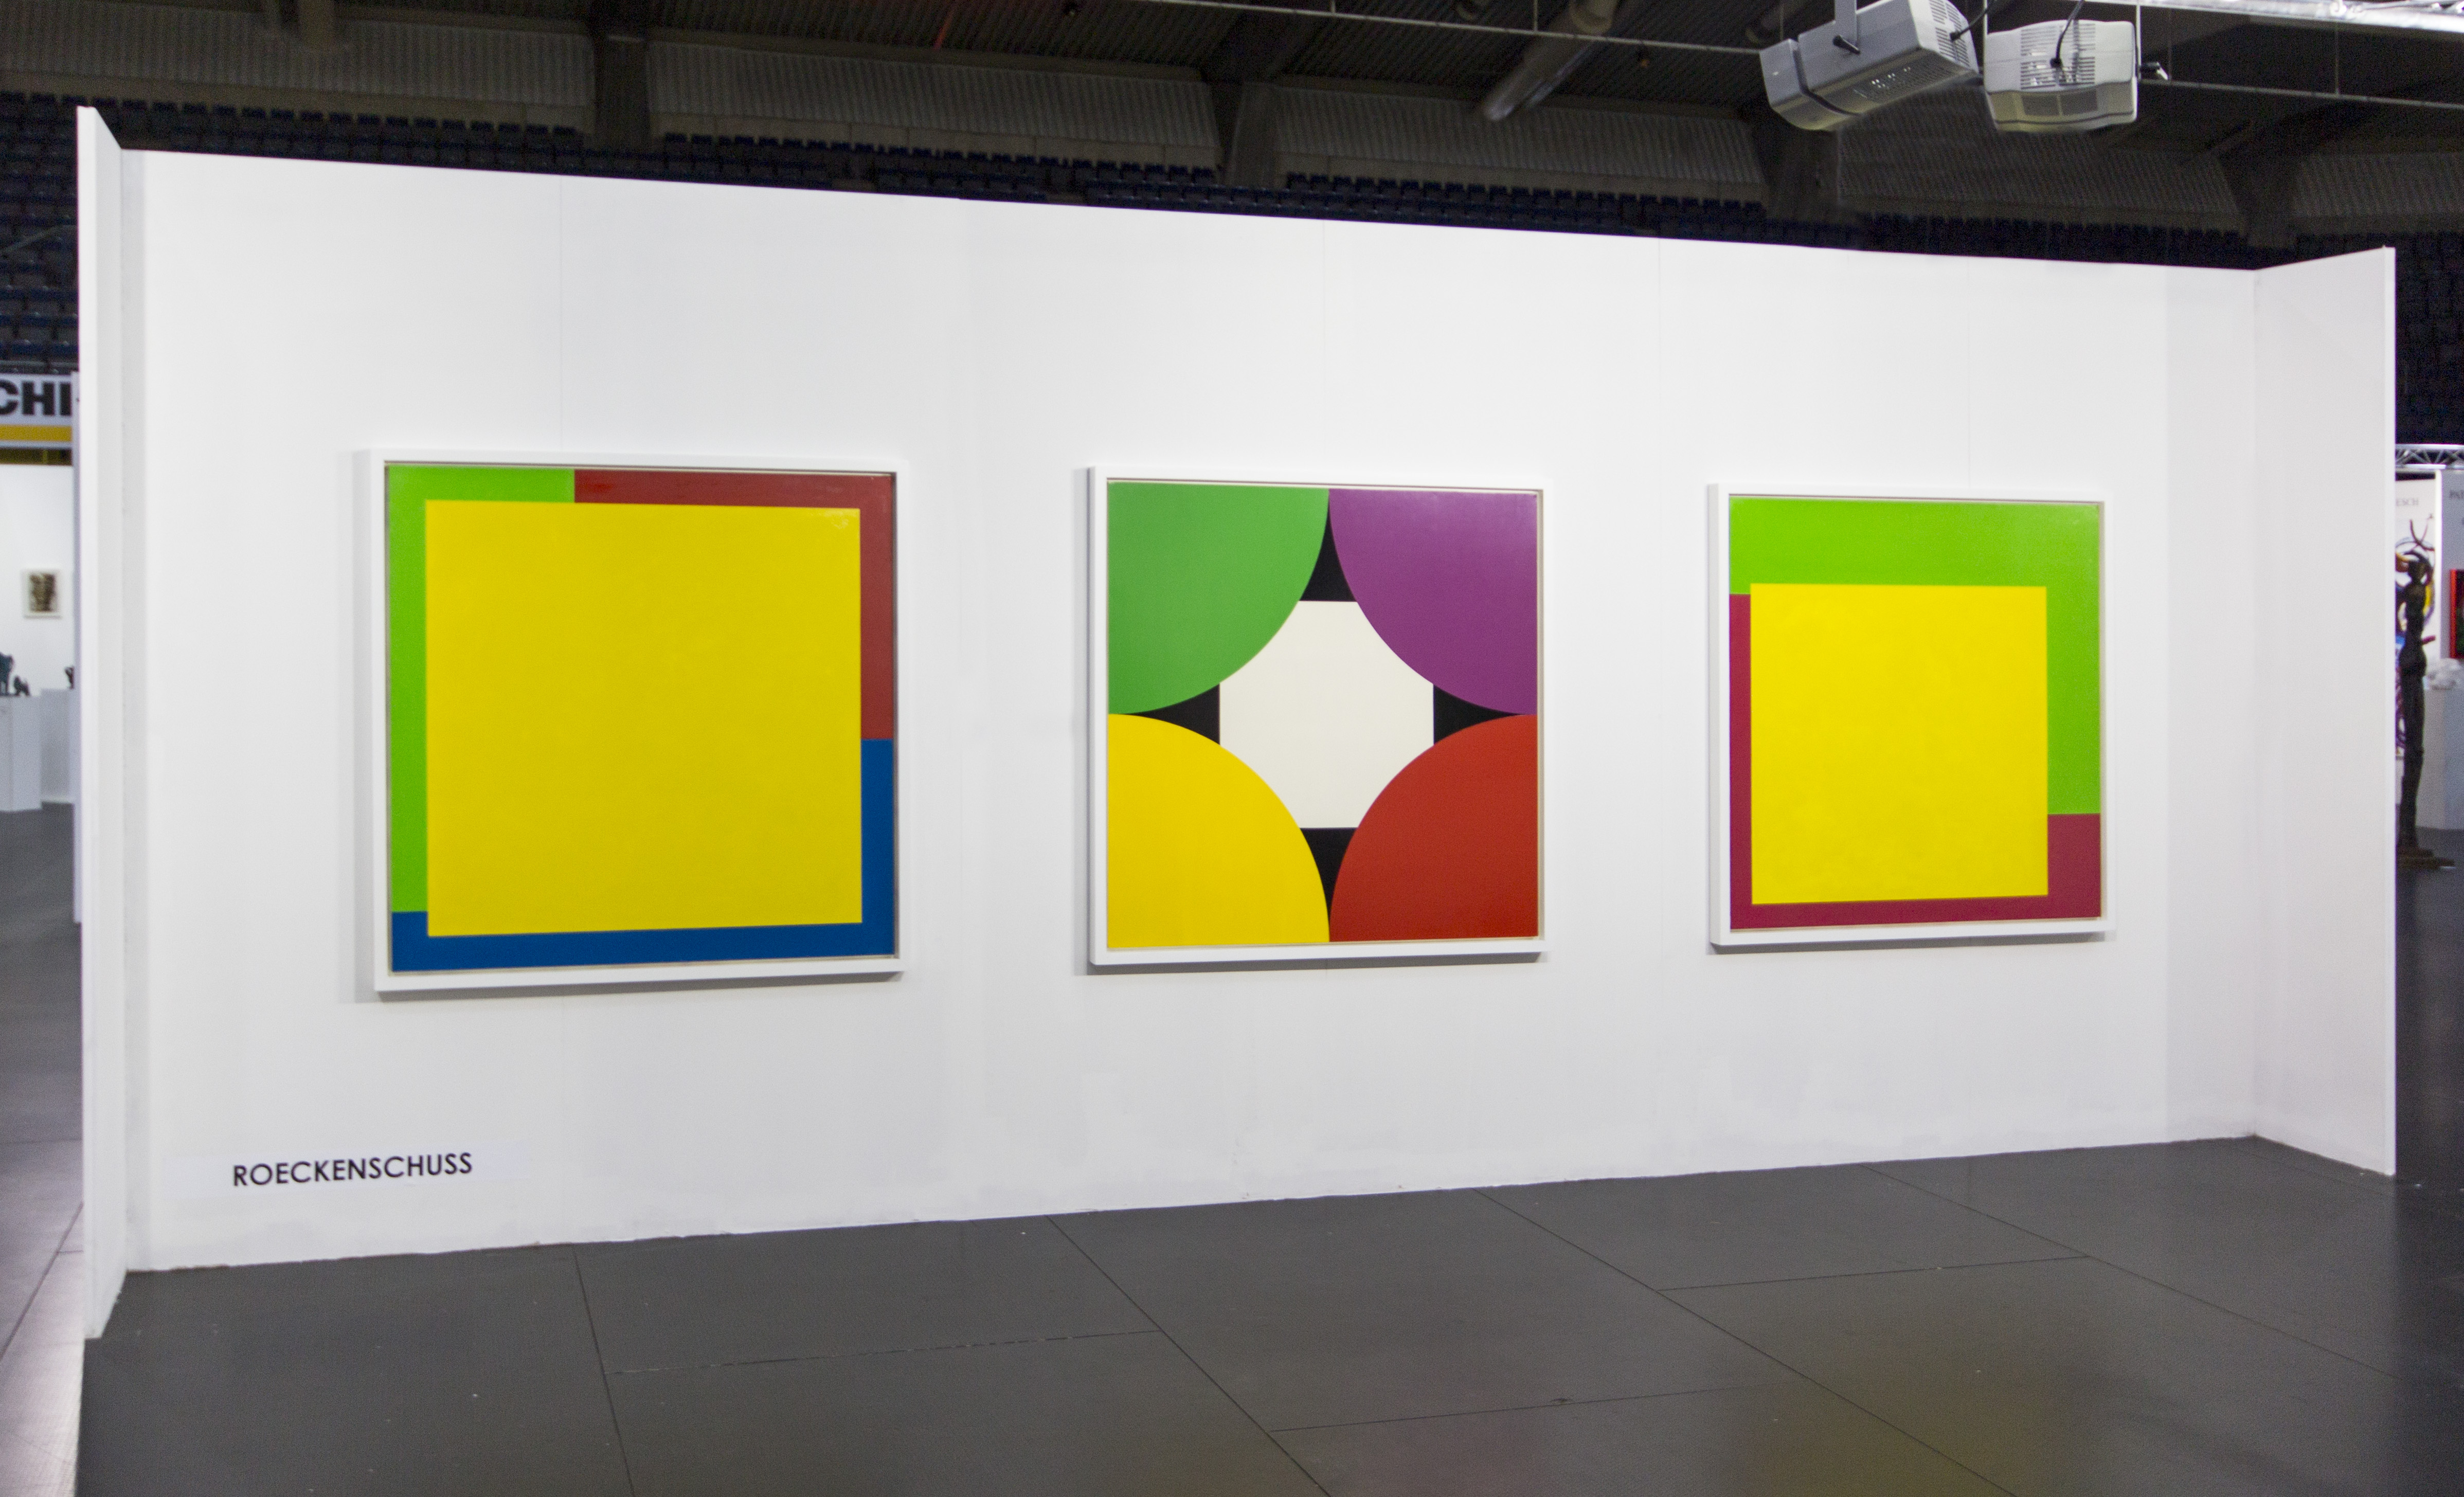 Christian Roeckenschuss - Farbfeldmalerei